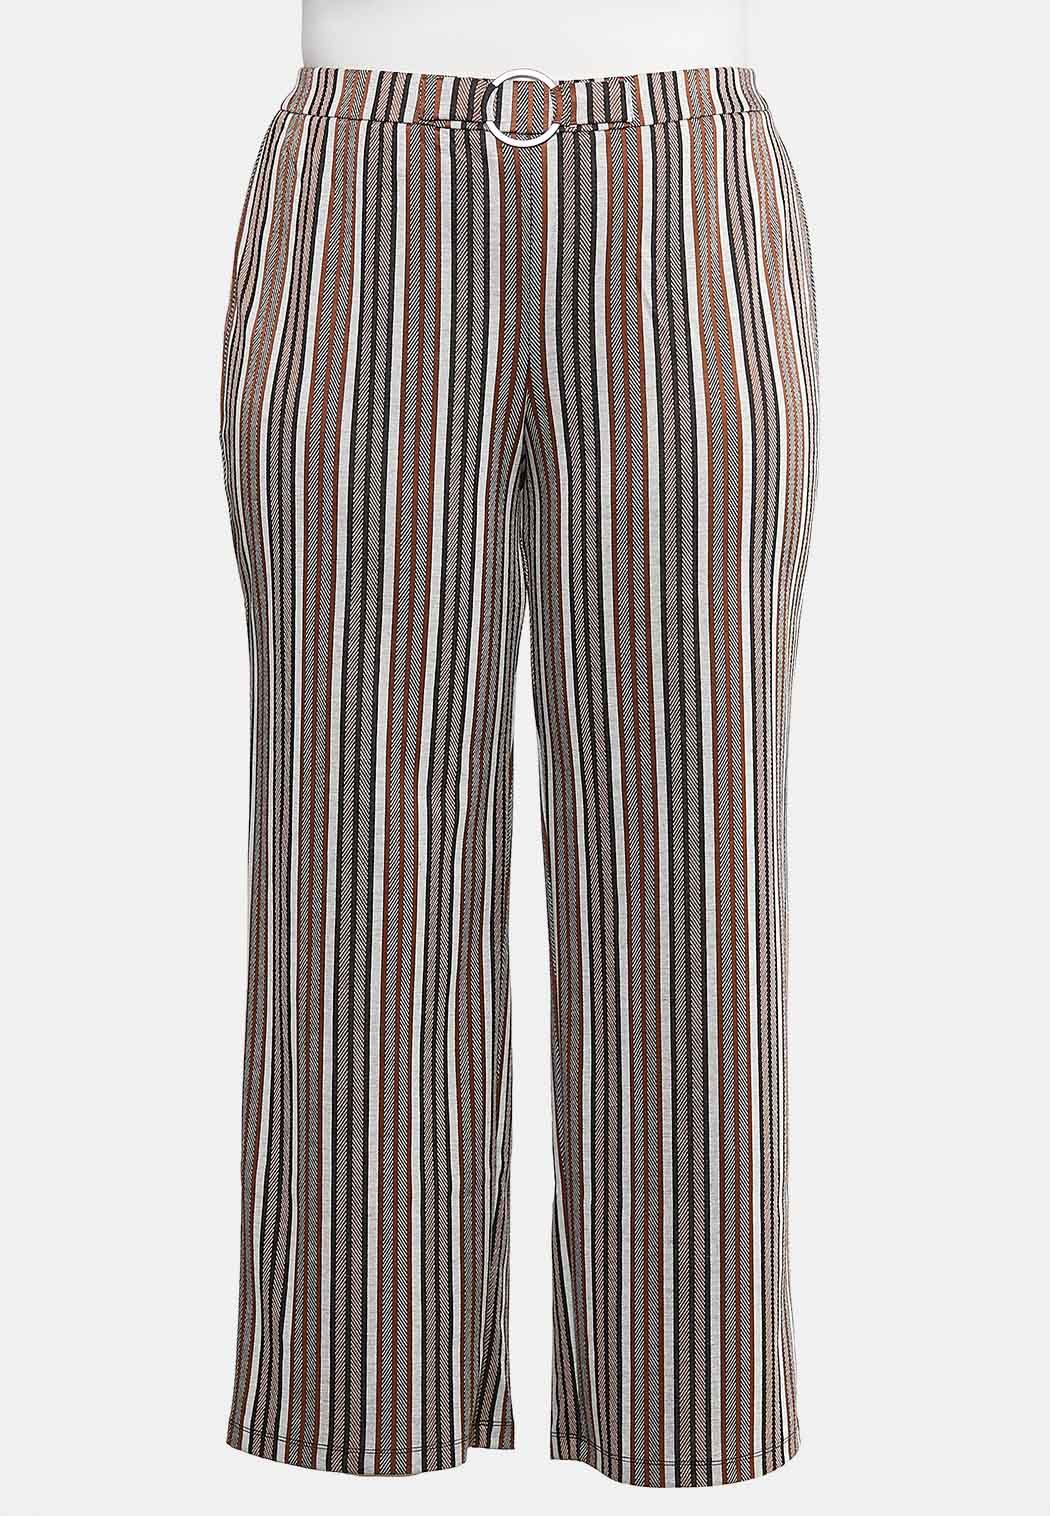 Plus Size Wide Leg Stripe Belted Pants Pants Cato Fashions